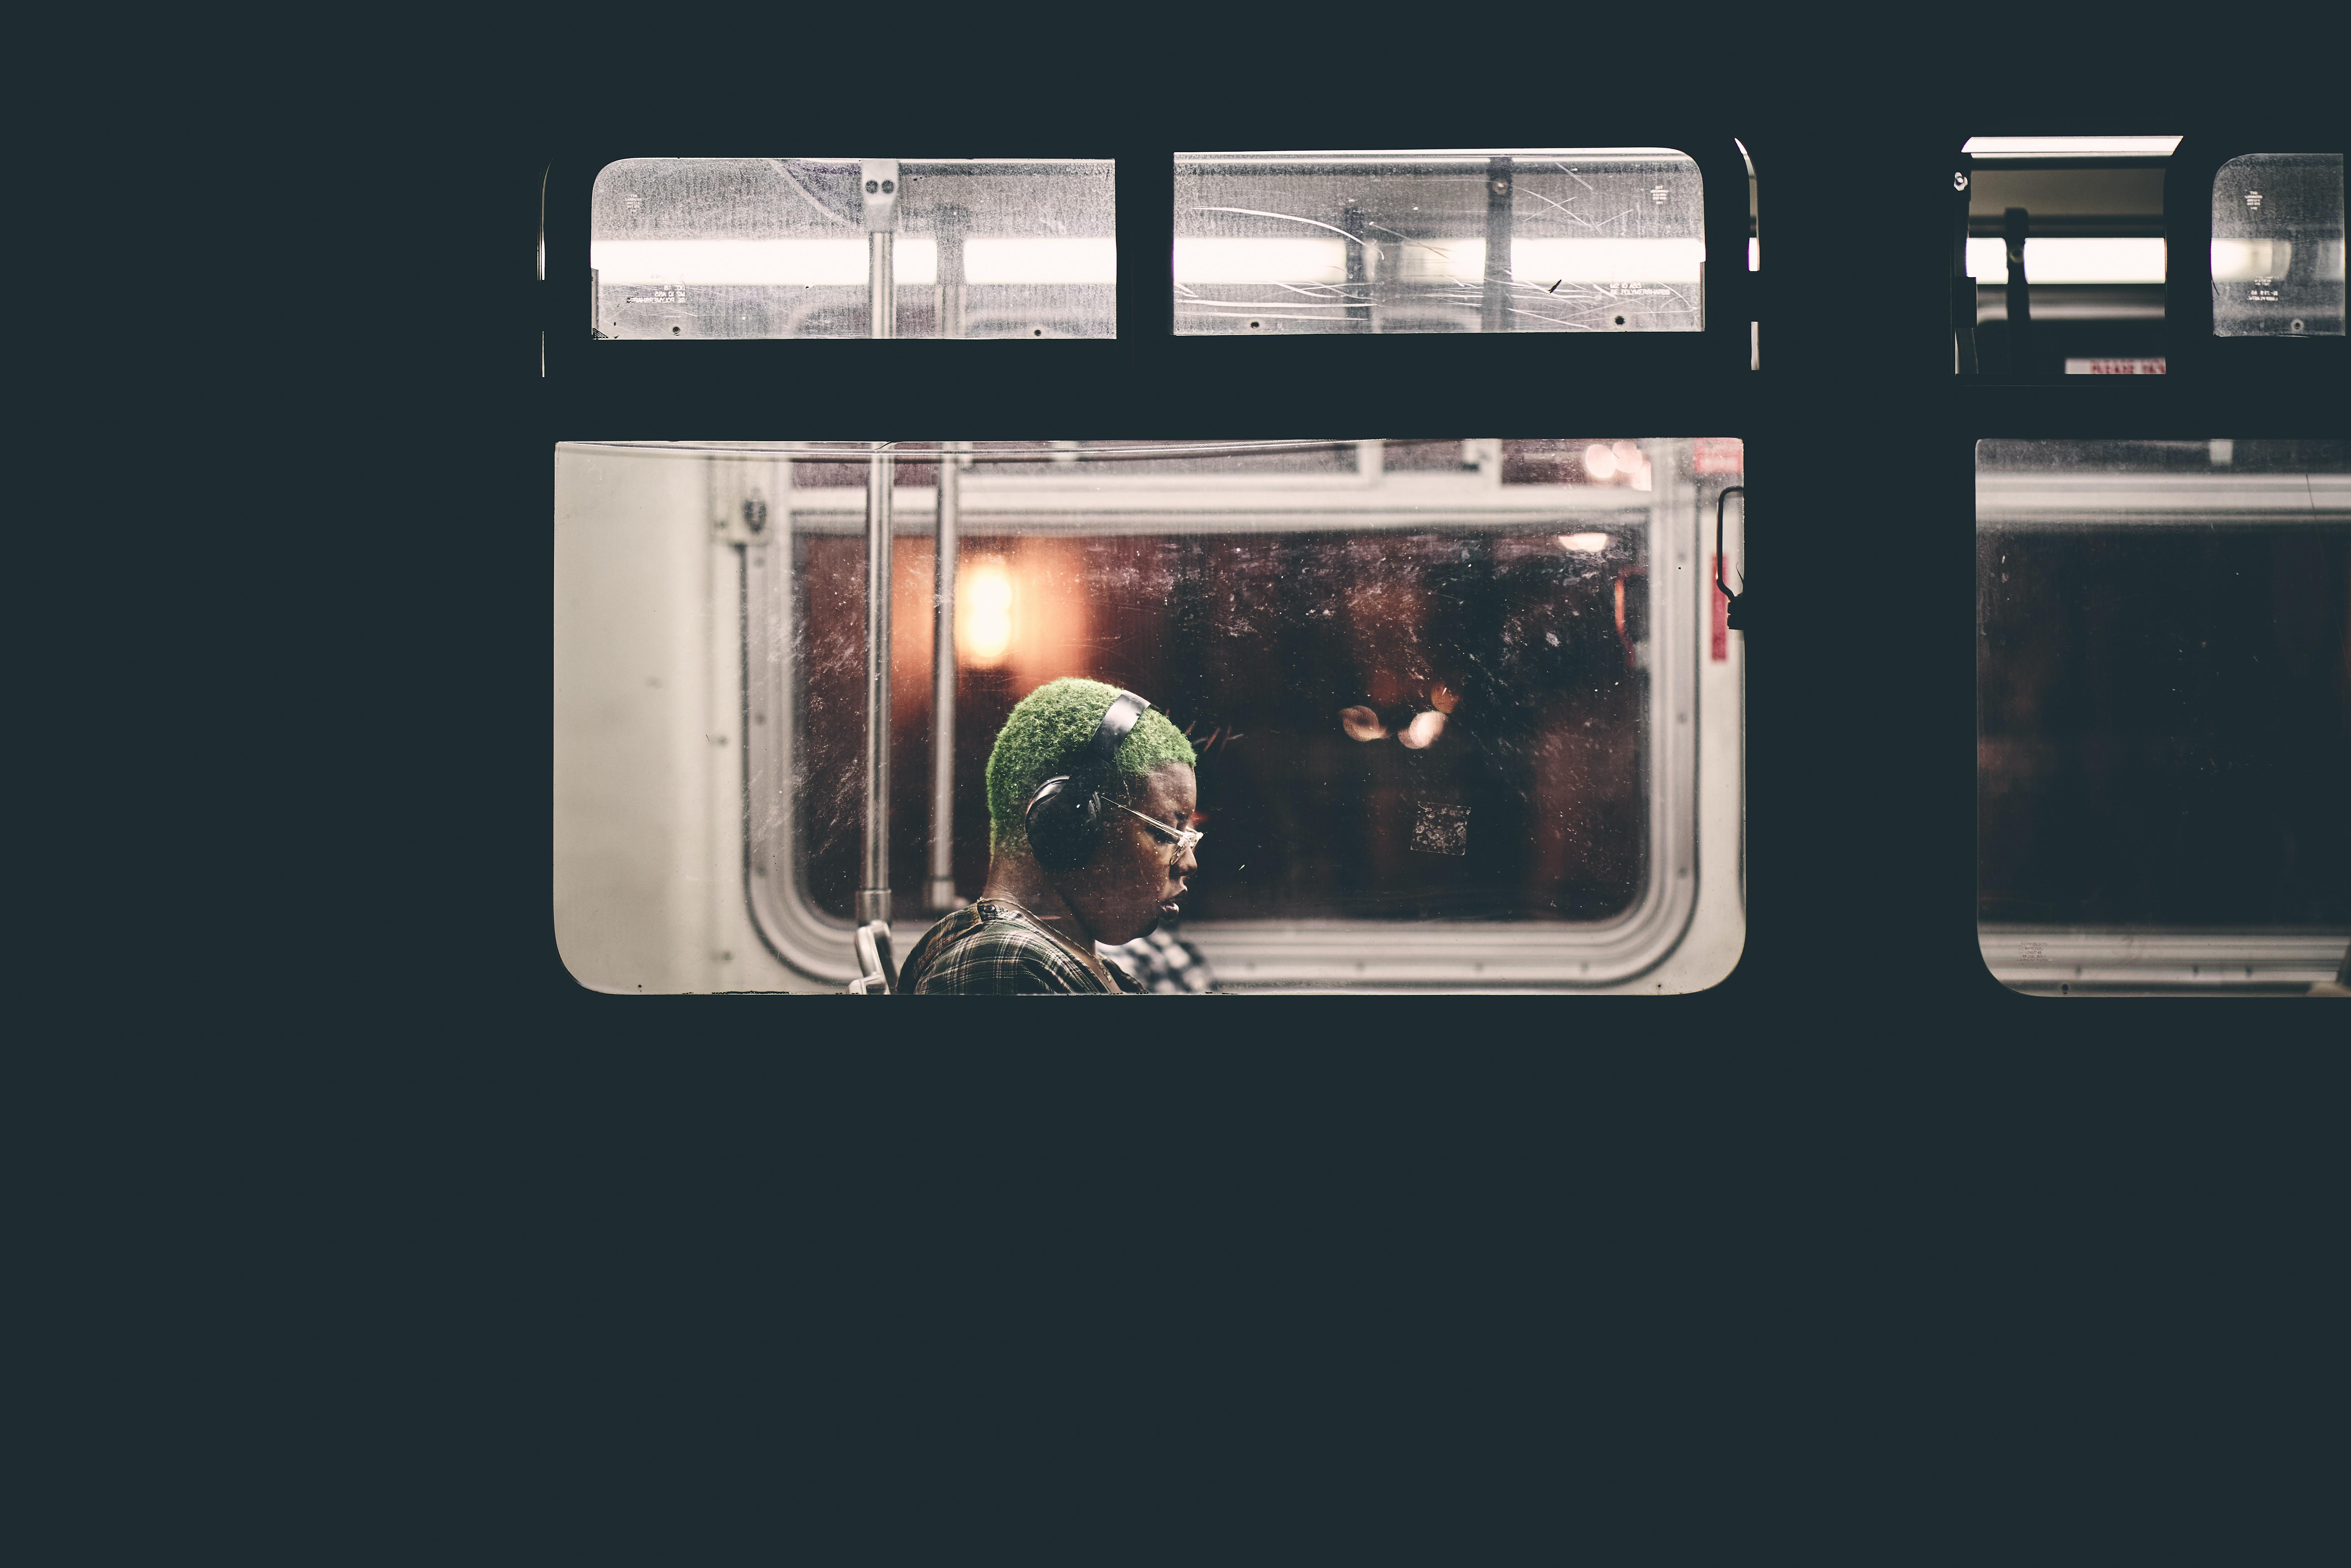 man sitting inside train wearing black headphones